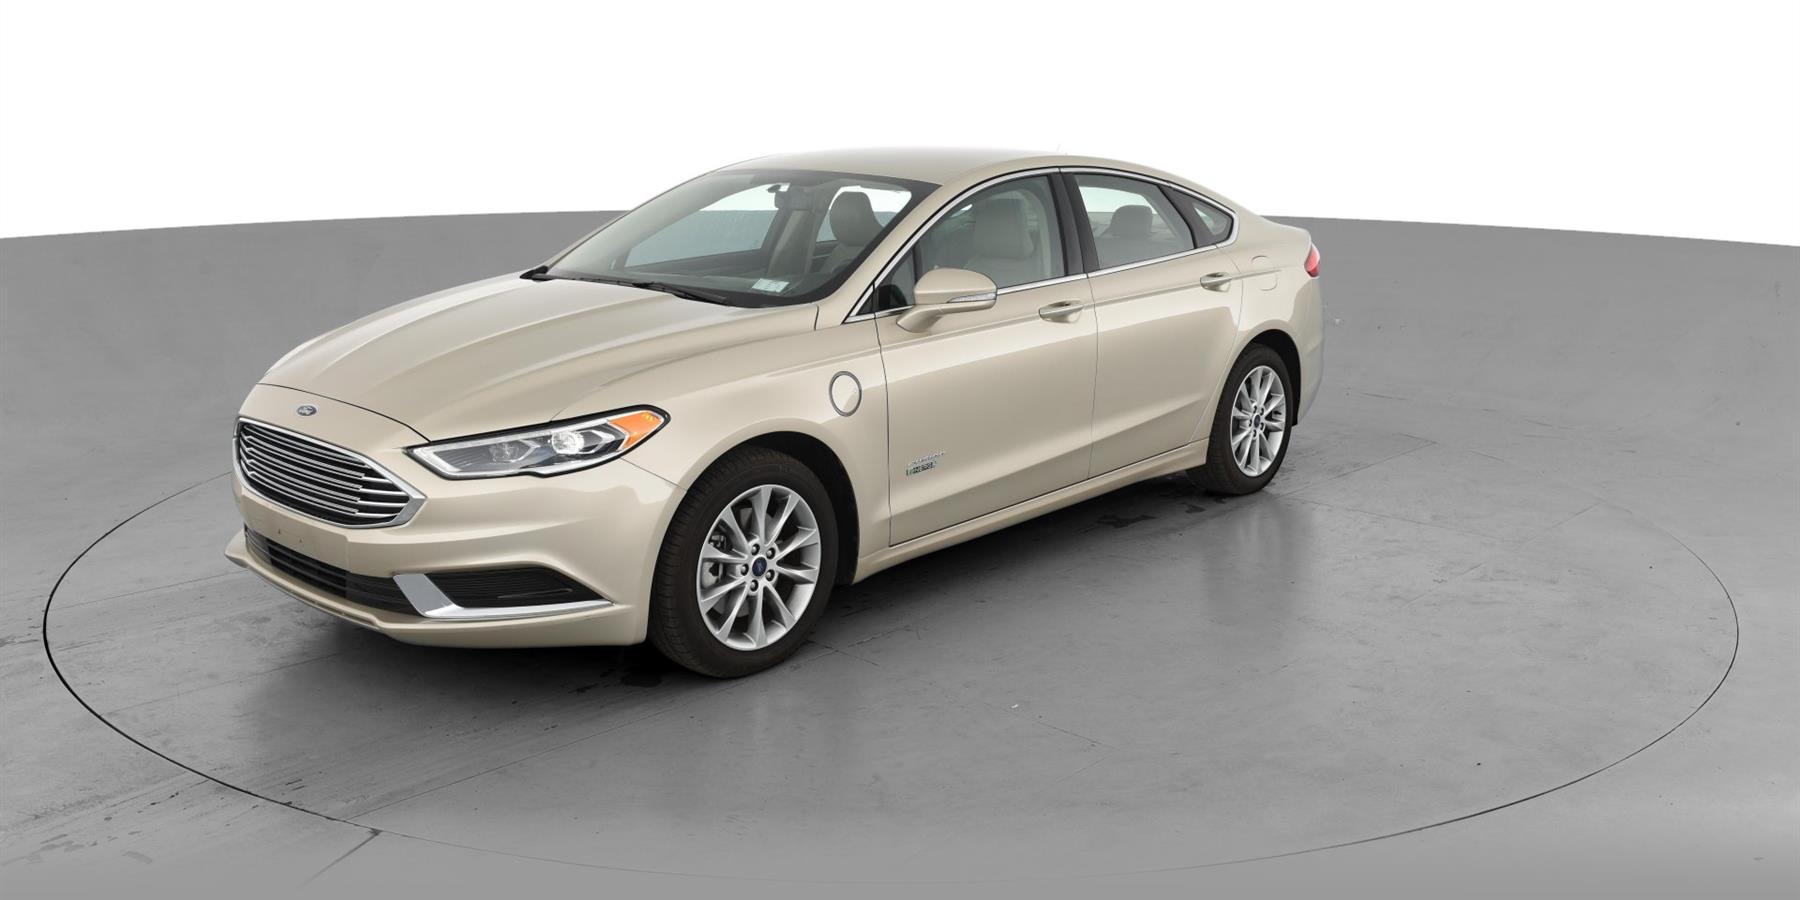 2018 ford fusion energi plug in hybrid se luxury sedan 4d for sale